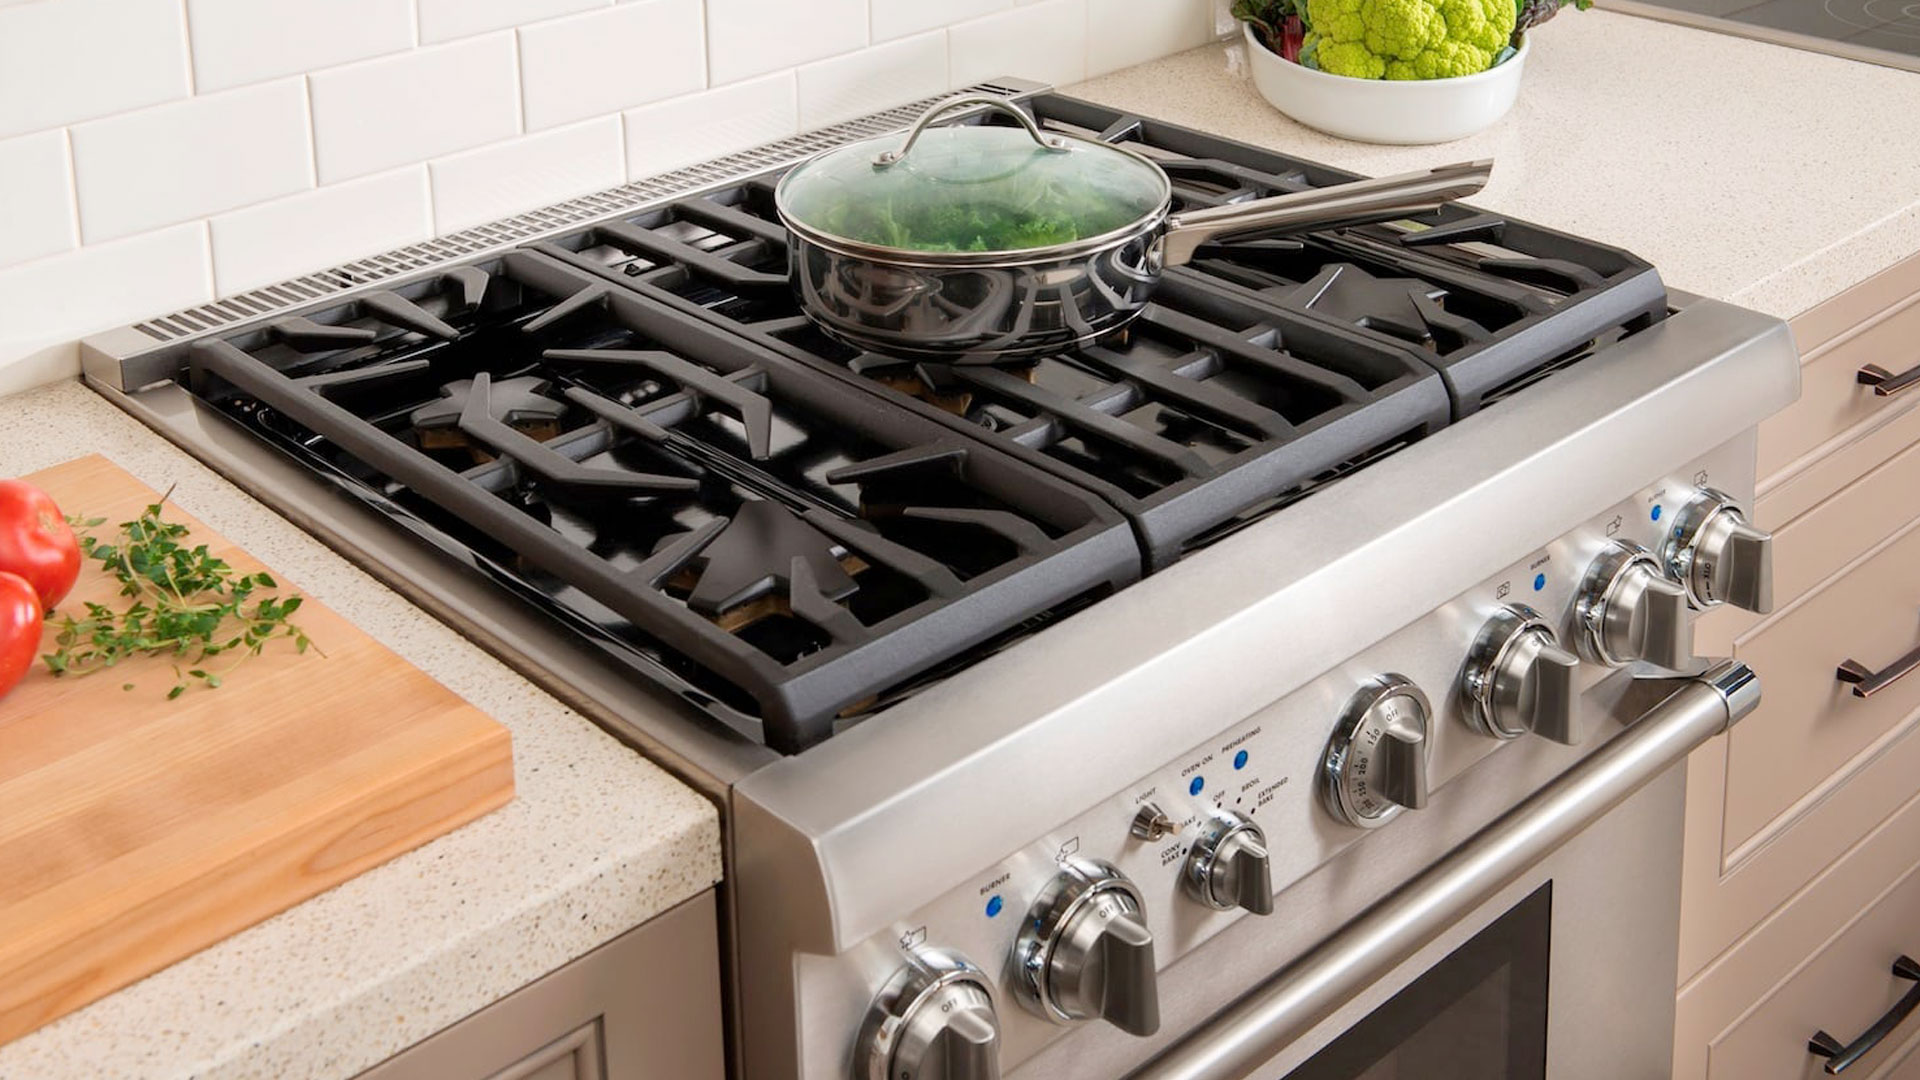 Thermador Appliance Repair Service Denver | Thermador Appliance Repair Pros